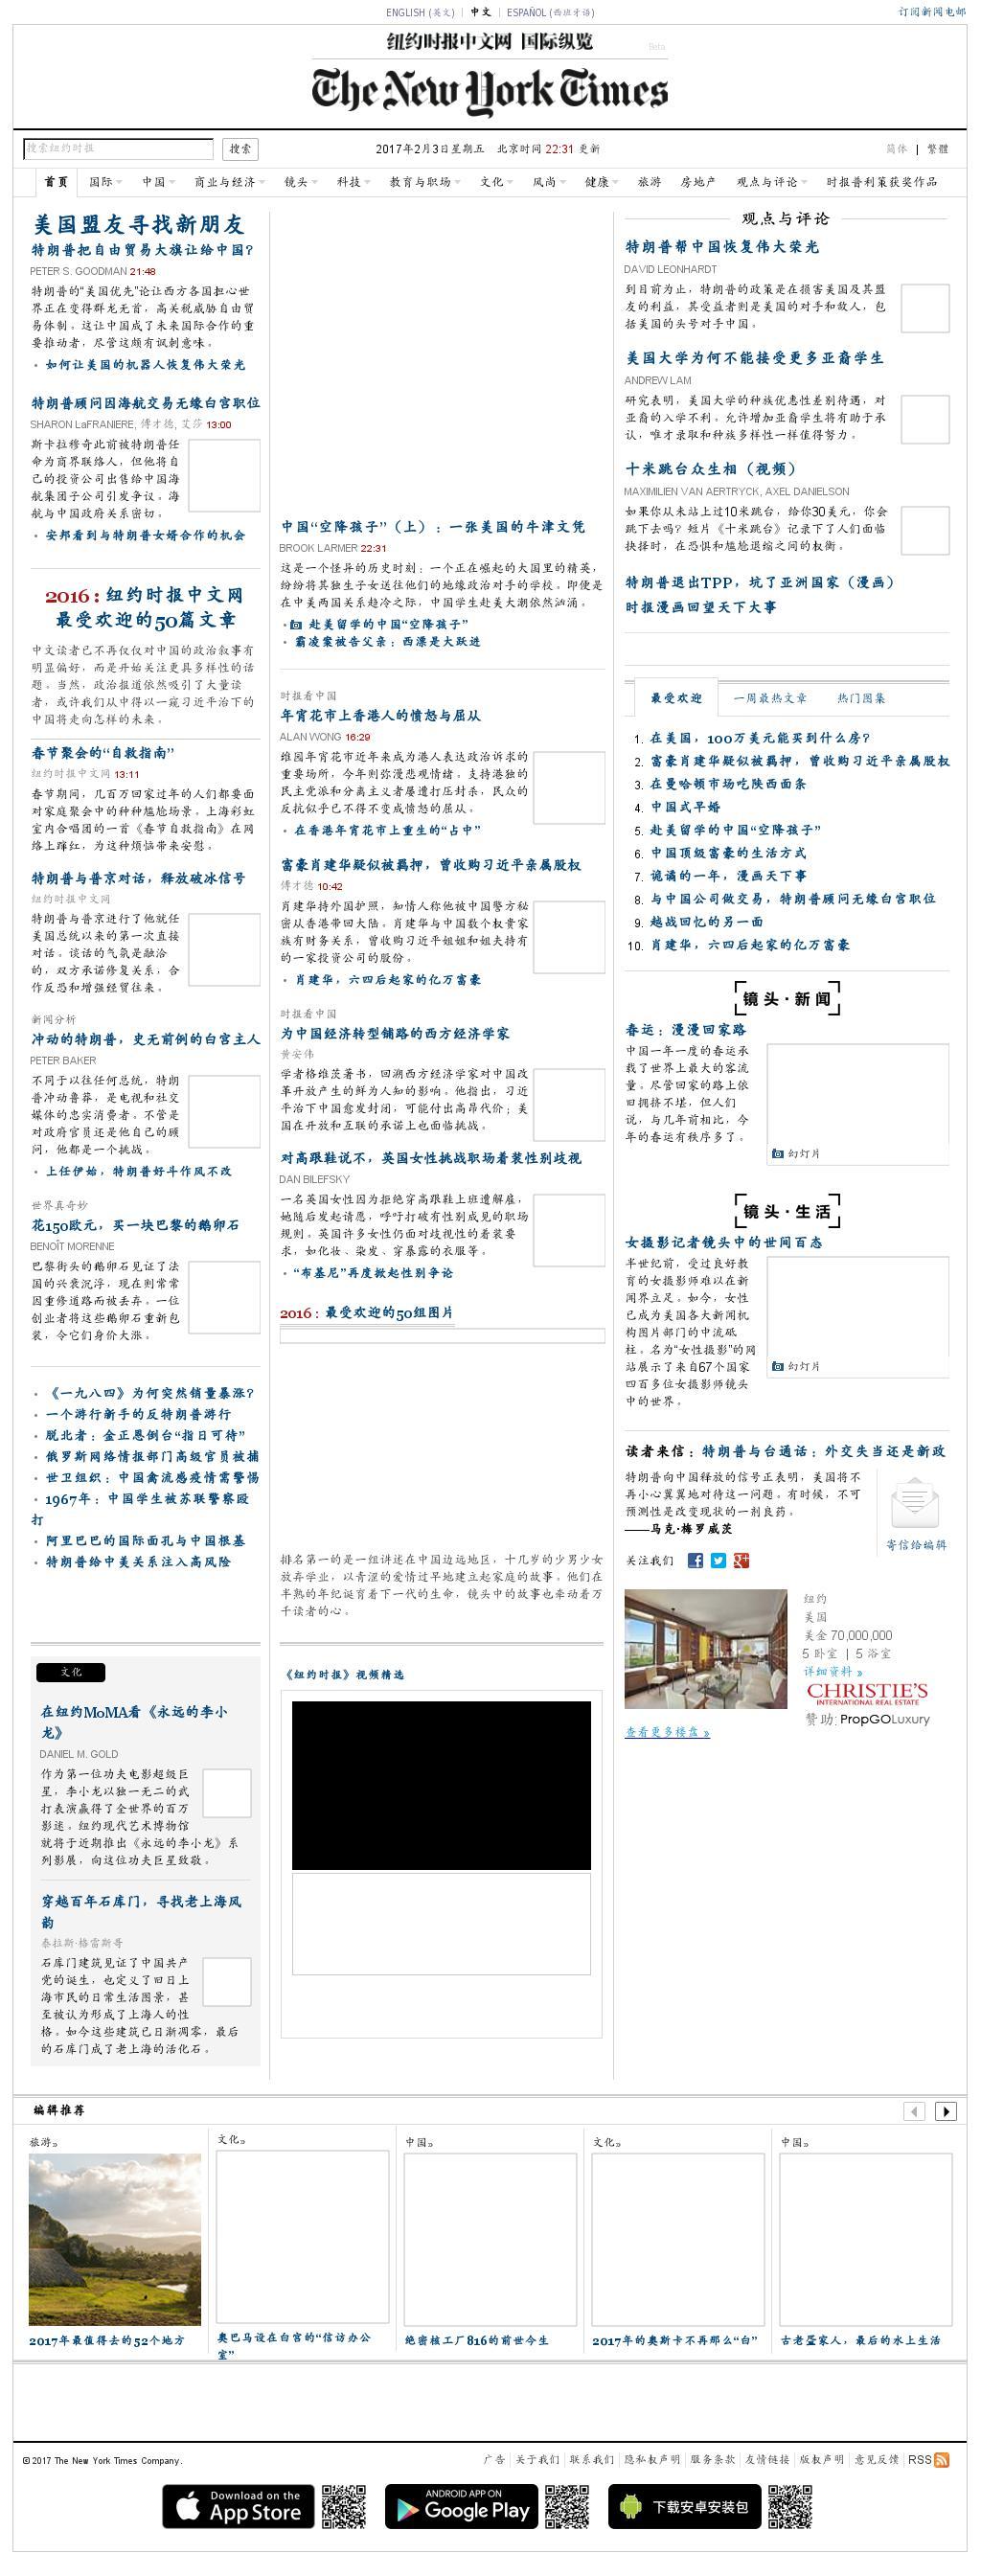 The New York Times (Chinese) at Friday Feb. 3, 2017, 11:11 p.m. UTC